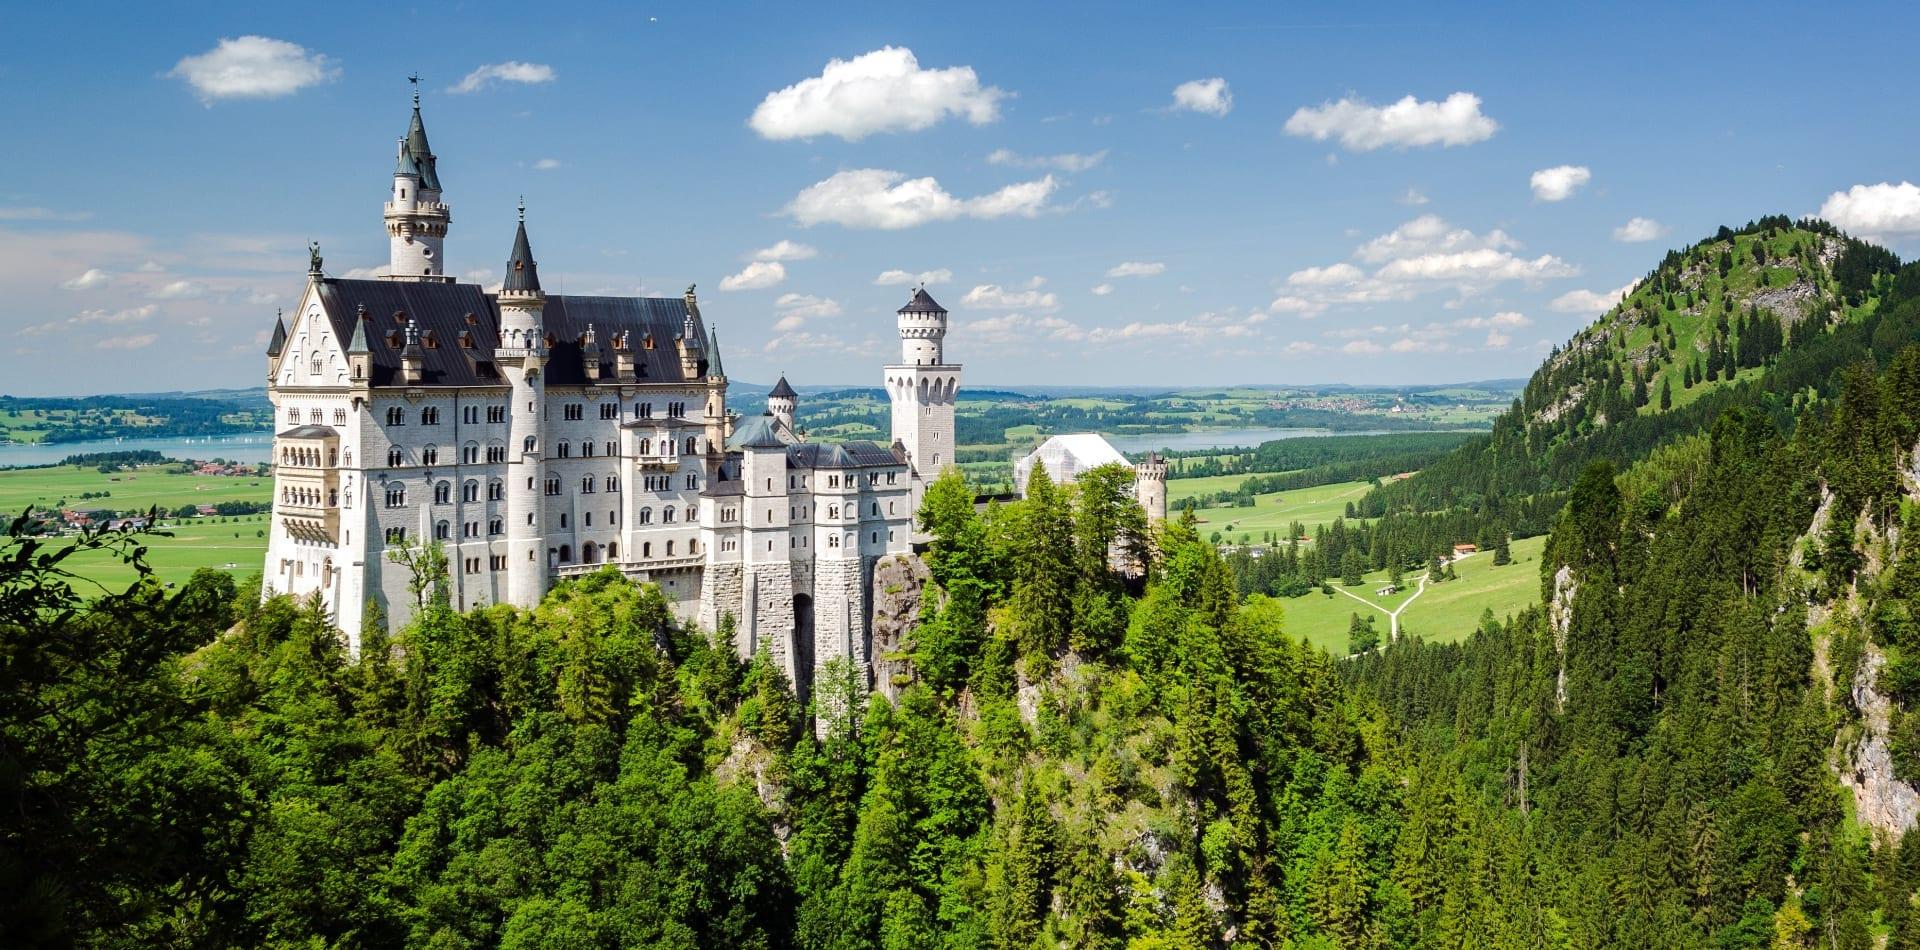 Bavarian castle in Germany